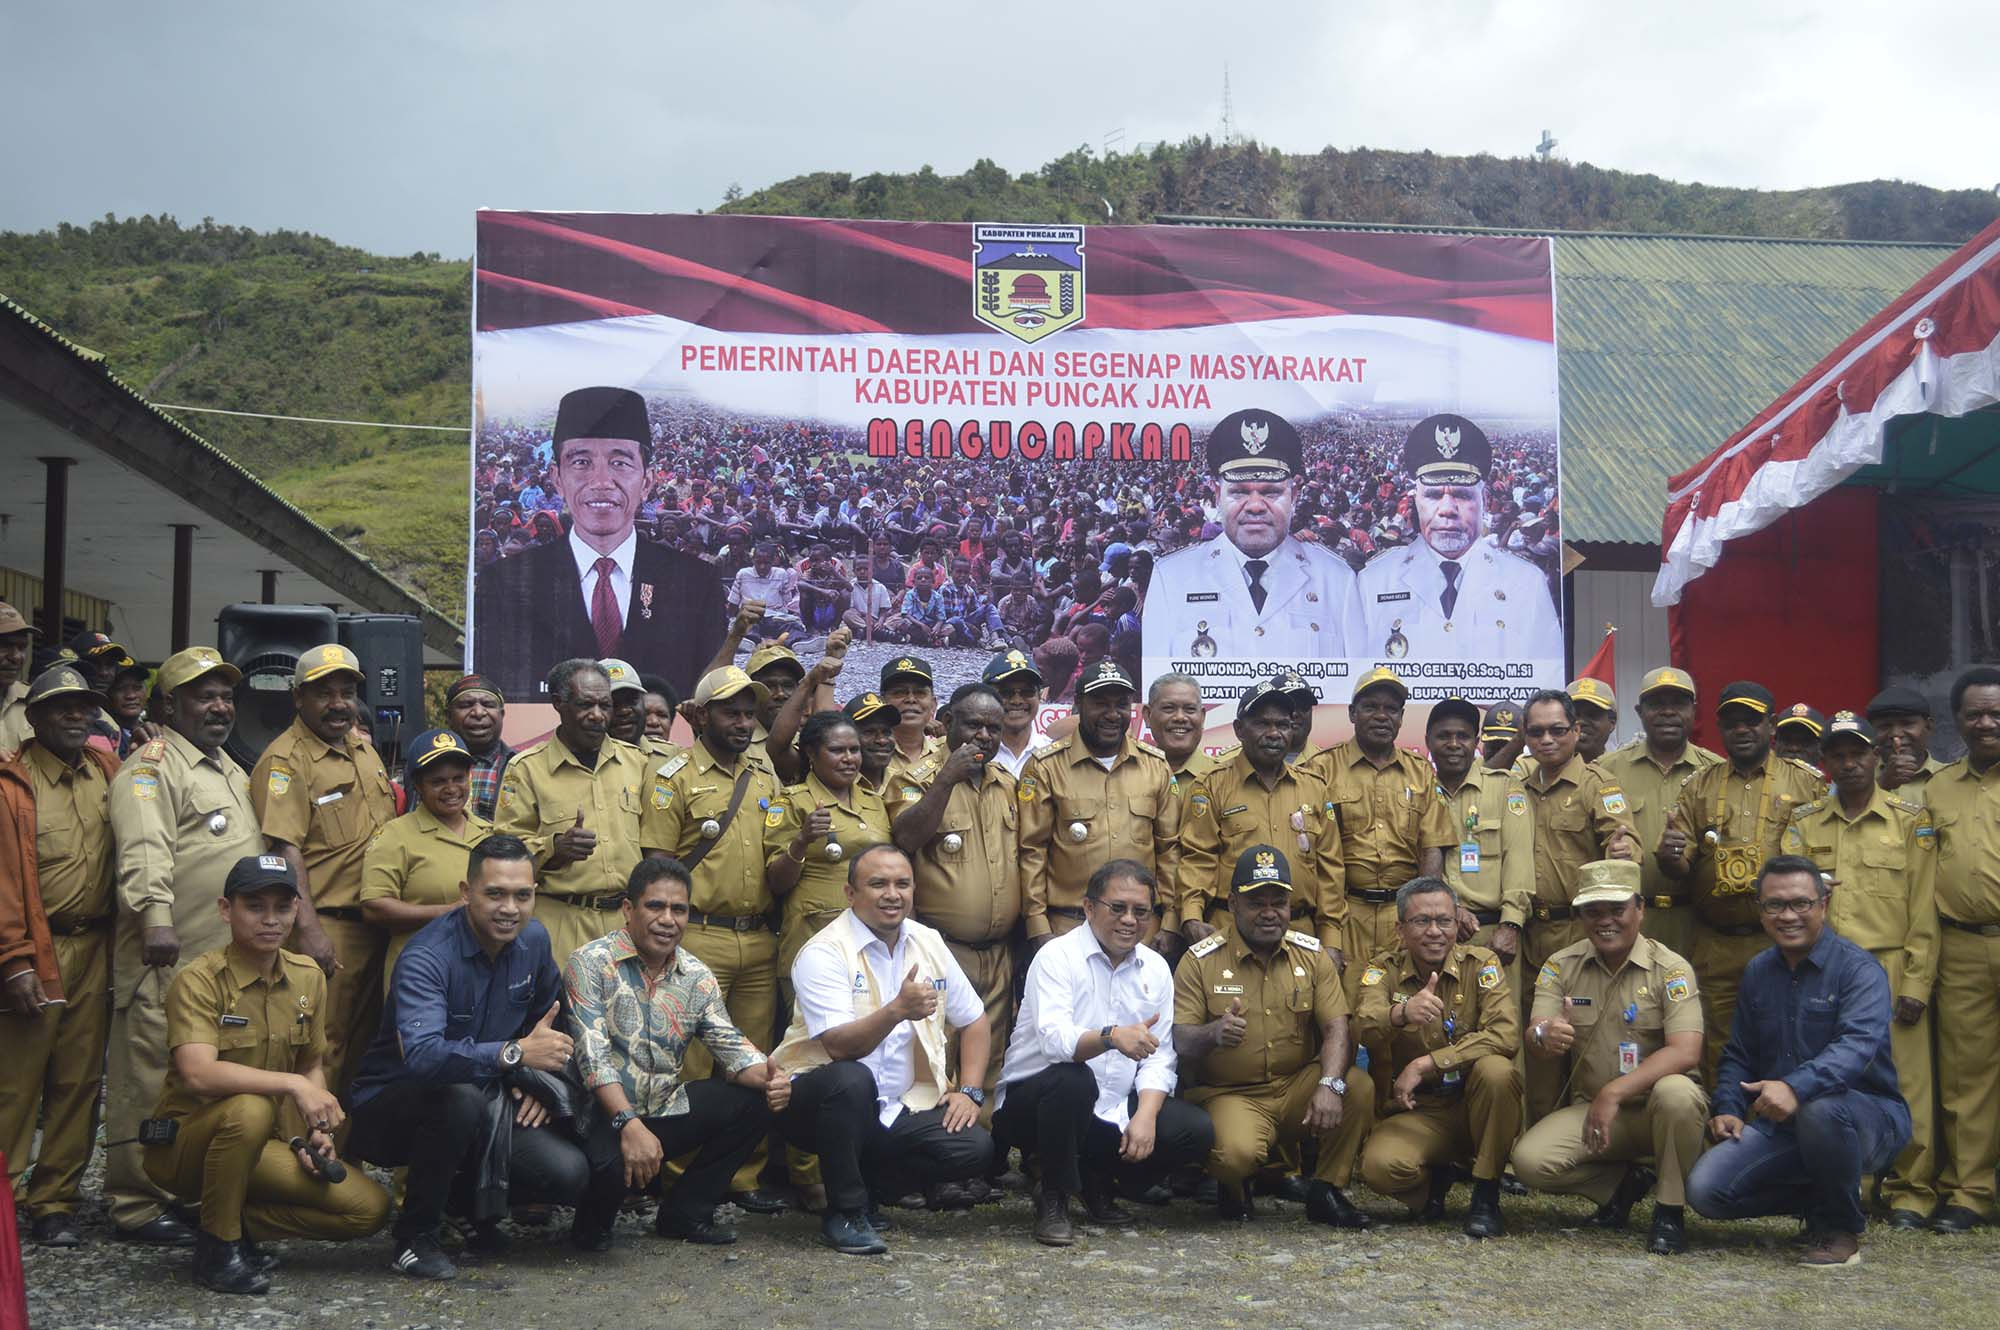 Foto Bersama Menteri Kominfo di Dampingi Bupati Puncak Jaya dan pejabat Eselon II, III Kabupaten Puncak Jaya